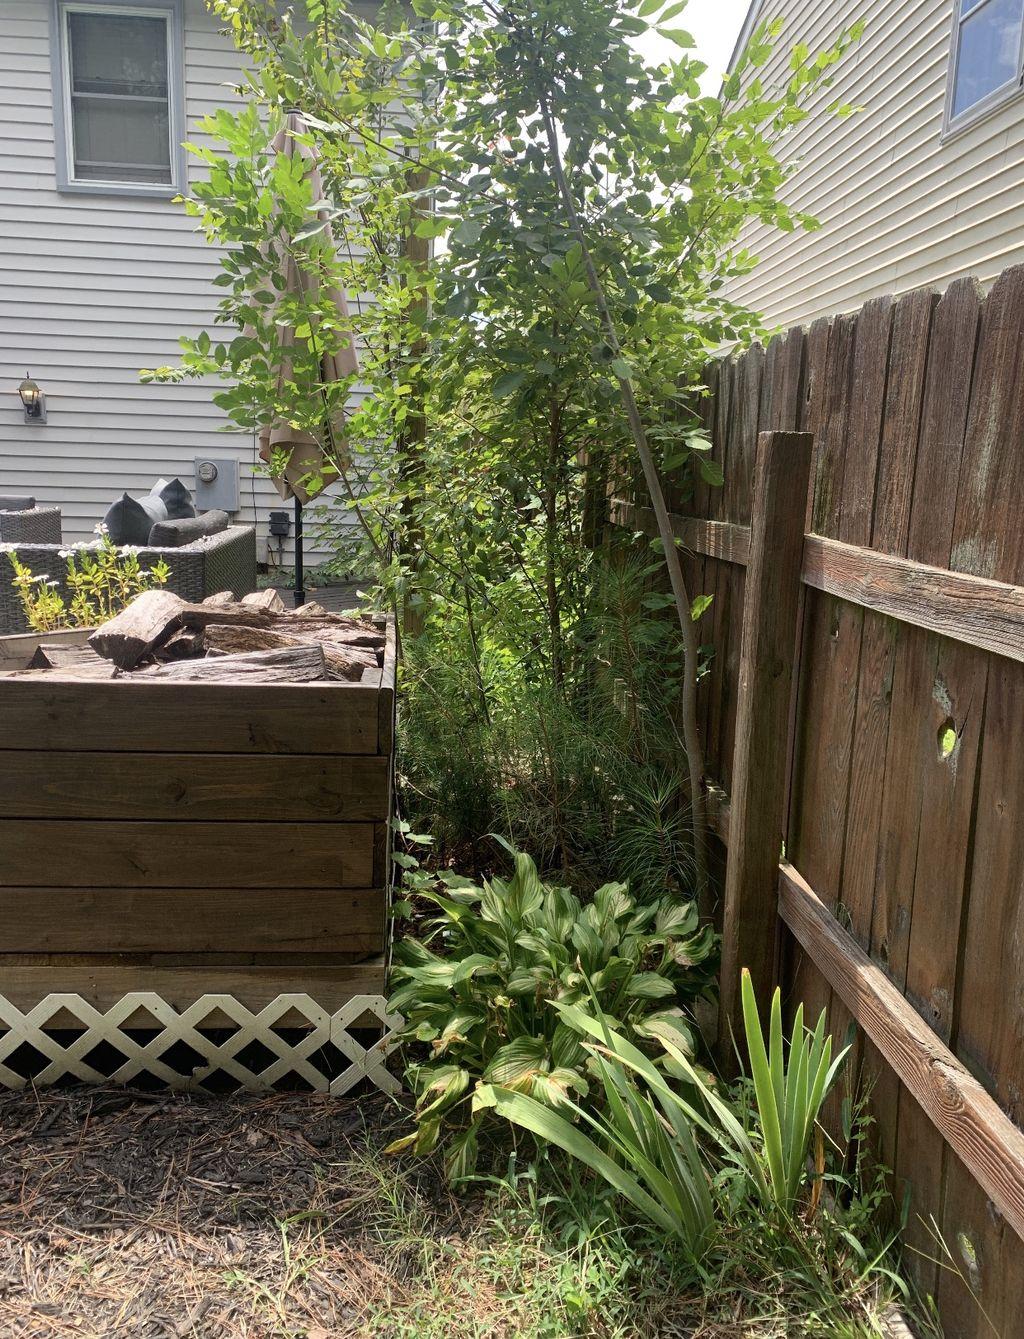 Outdoor Landscaping and Design - Virginia Beach 2019